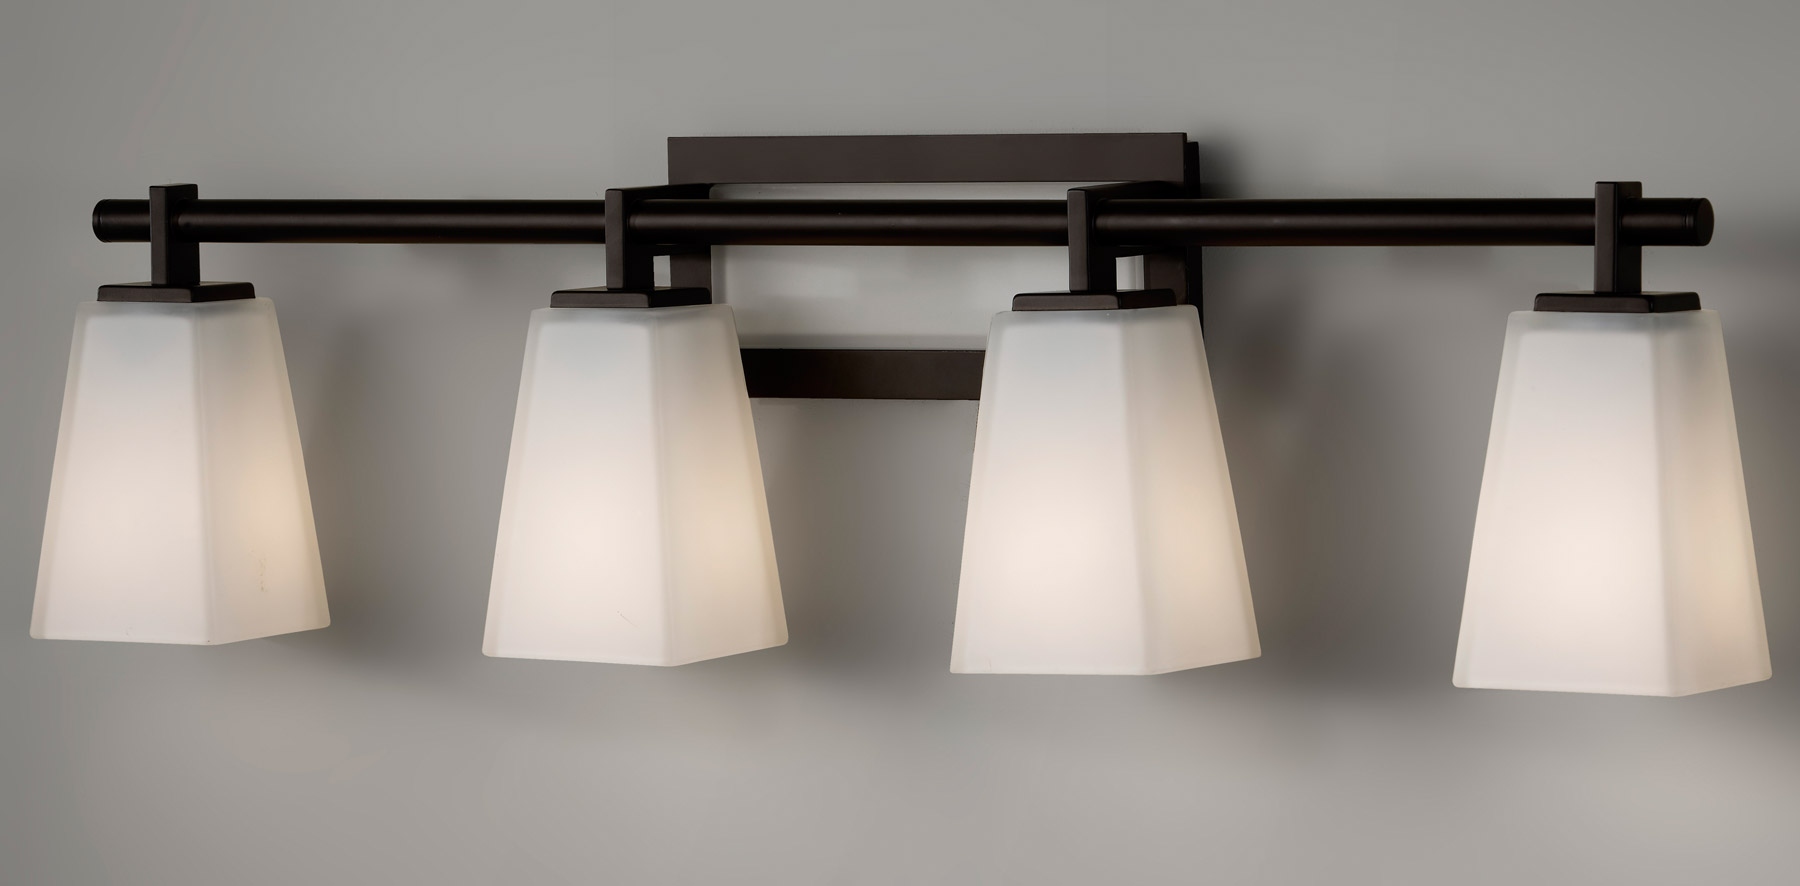 home wall lighting bathroom vanity lights murray feiss vs16604. Black Bedroom Furniture Sets. Home Design Ideas